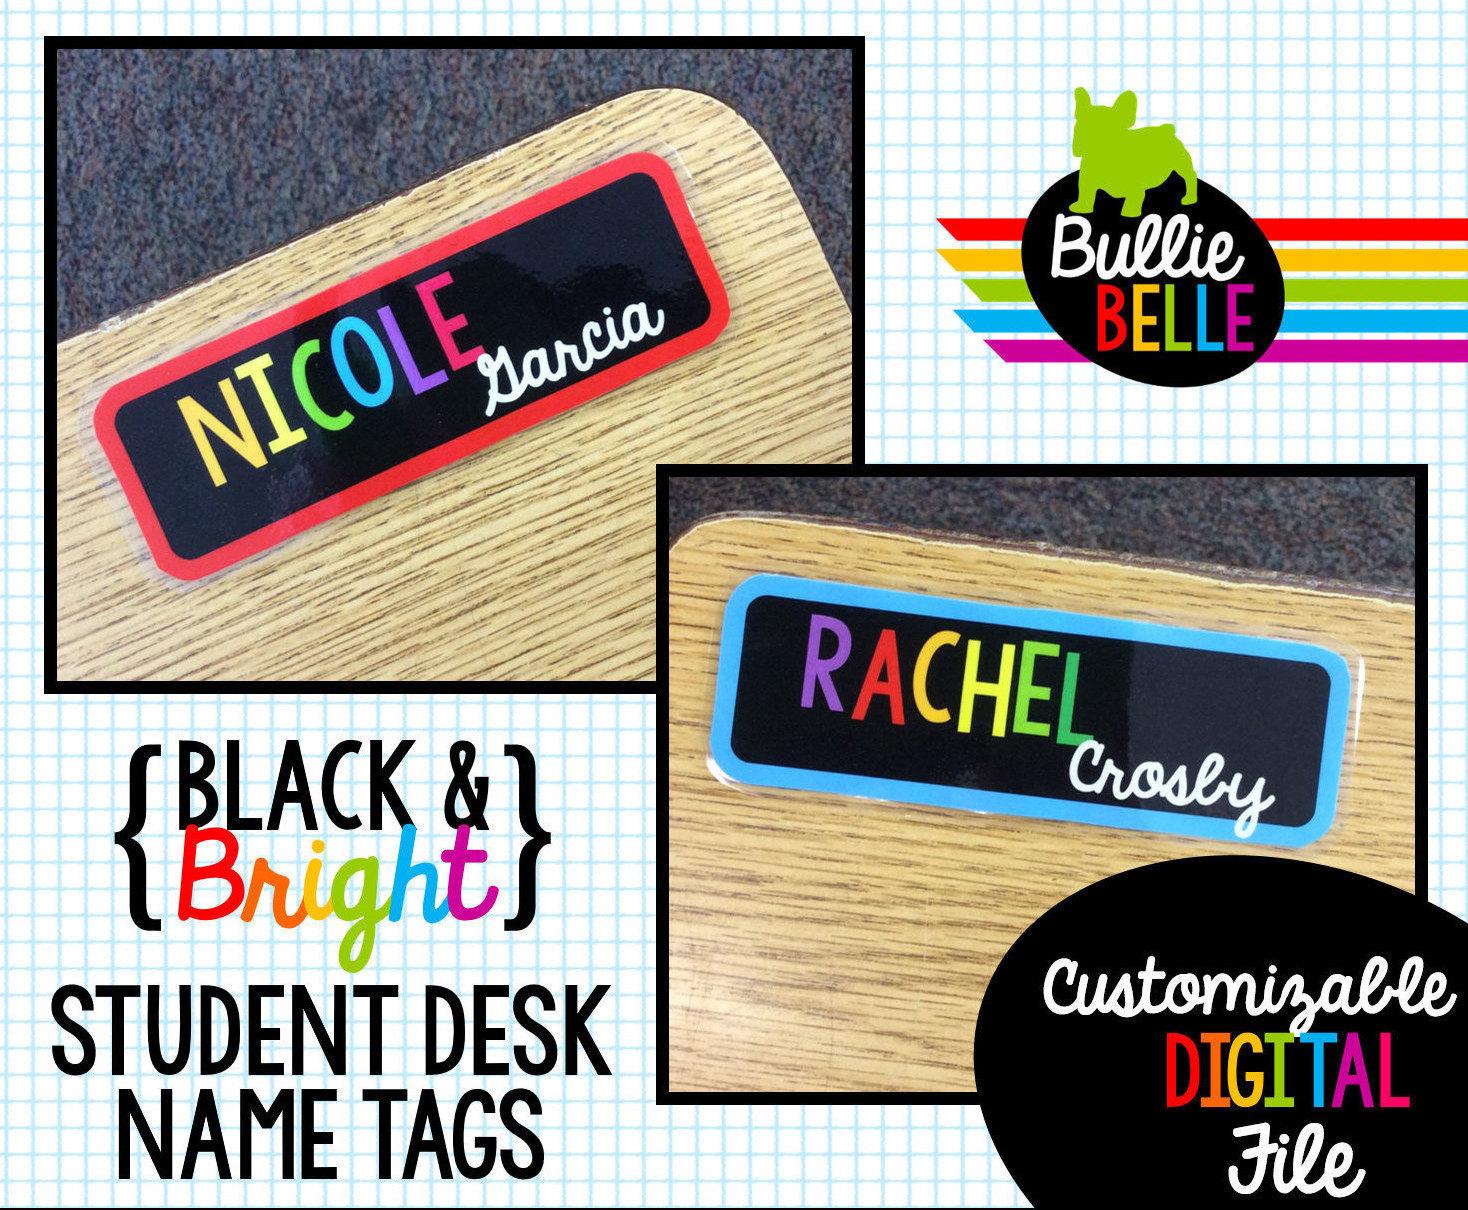 Student Name Plates: Black & Bright Student Desk Name Tags Student Nameplates